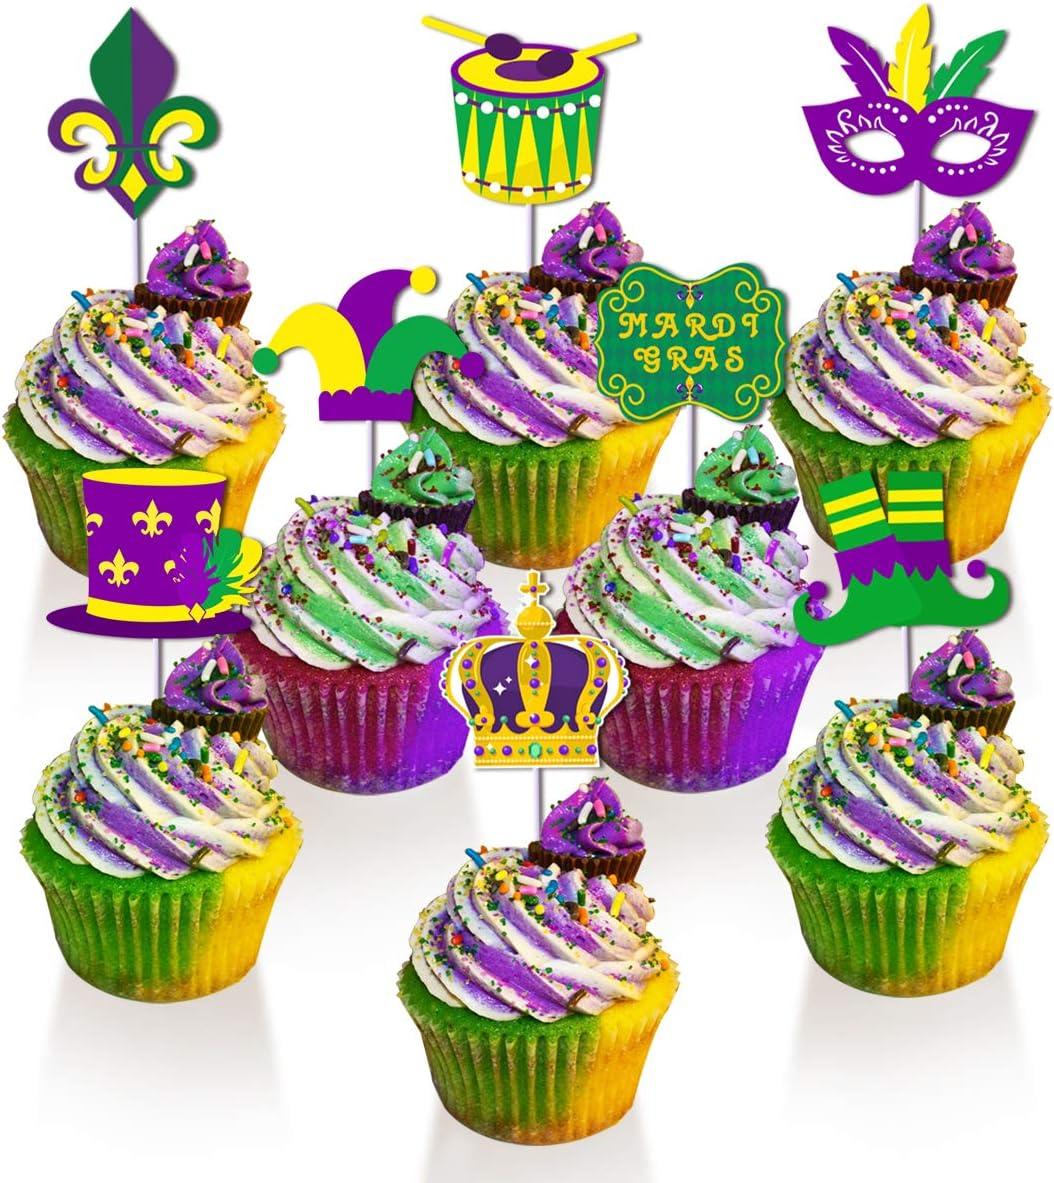 24 pcs Mardi Gras Cupcake Toppers Mardi Gras Dessert Cake Picks for New Orleans Carnival Themed Birthday Party Baby Shower Decor